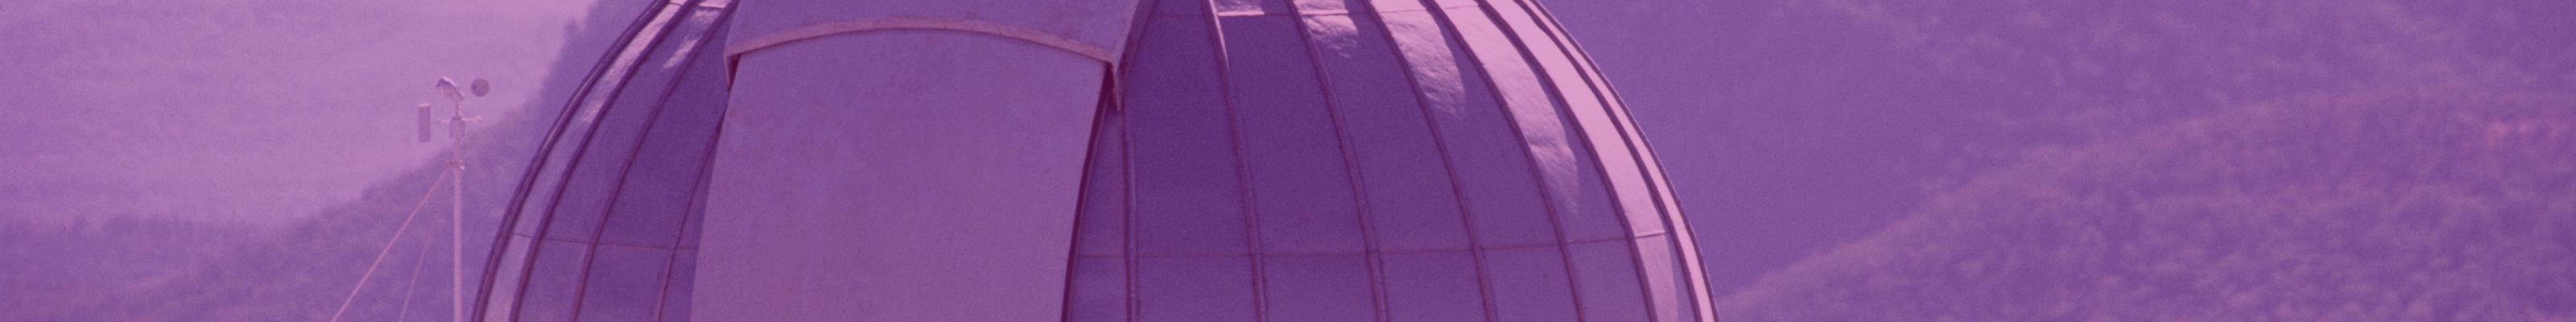 upc-genere-observatori.png